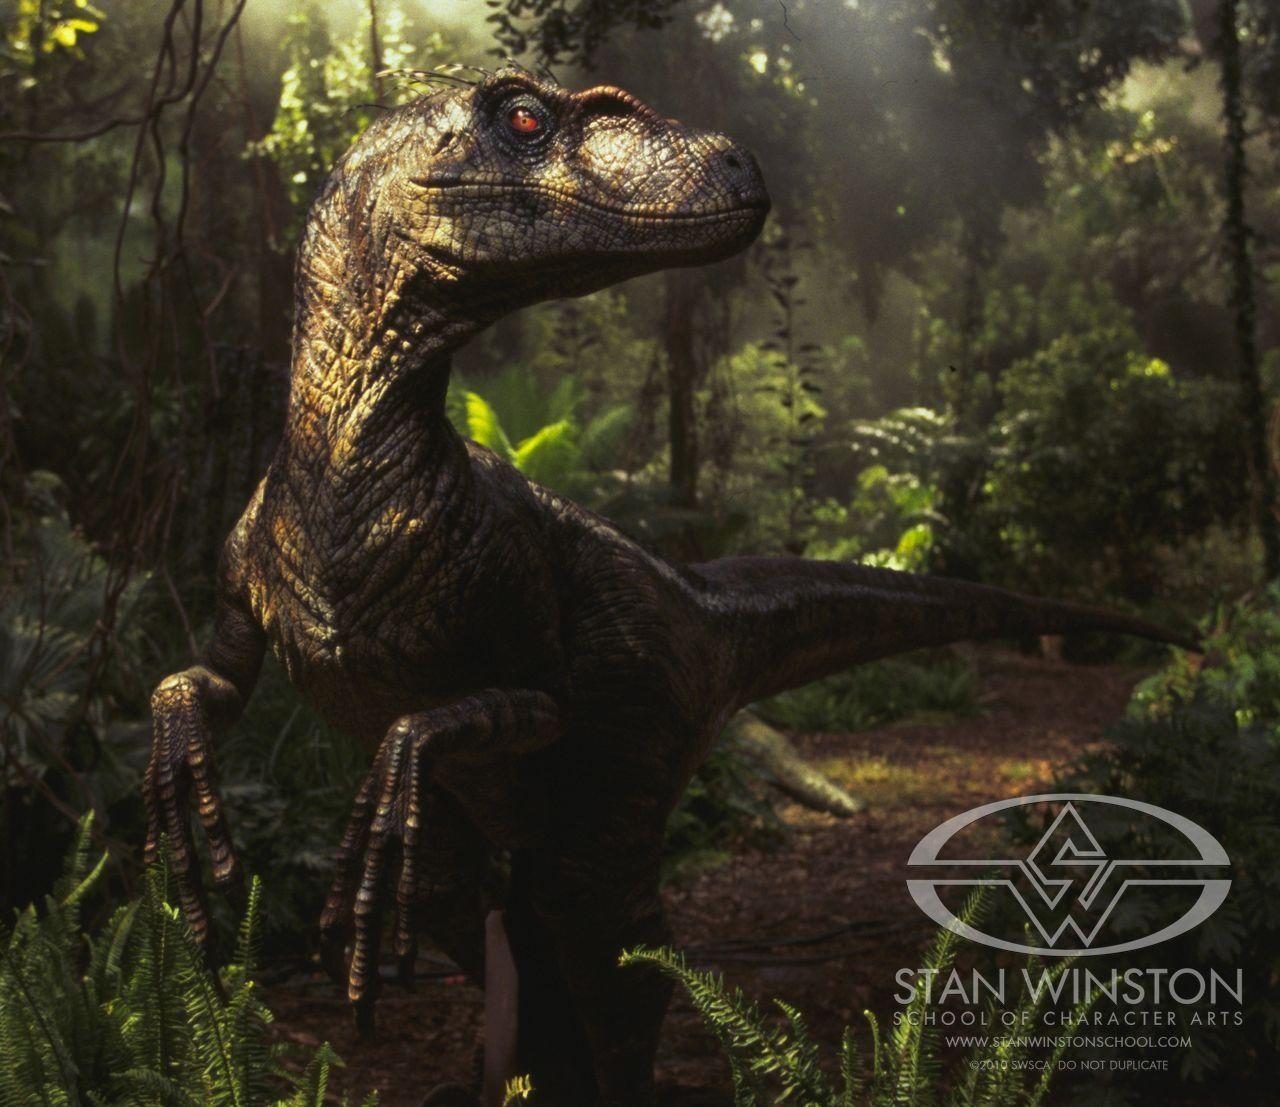 Pics For Gt Dinosaurs Velociraptor Jurassic Park